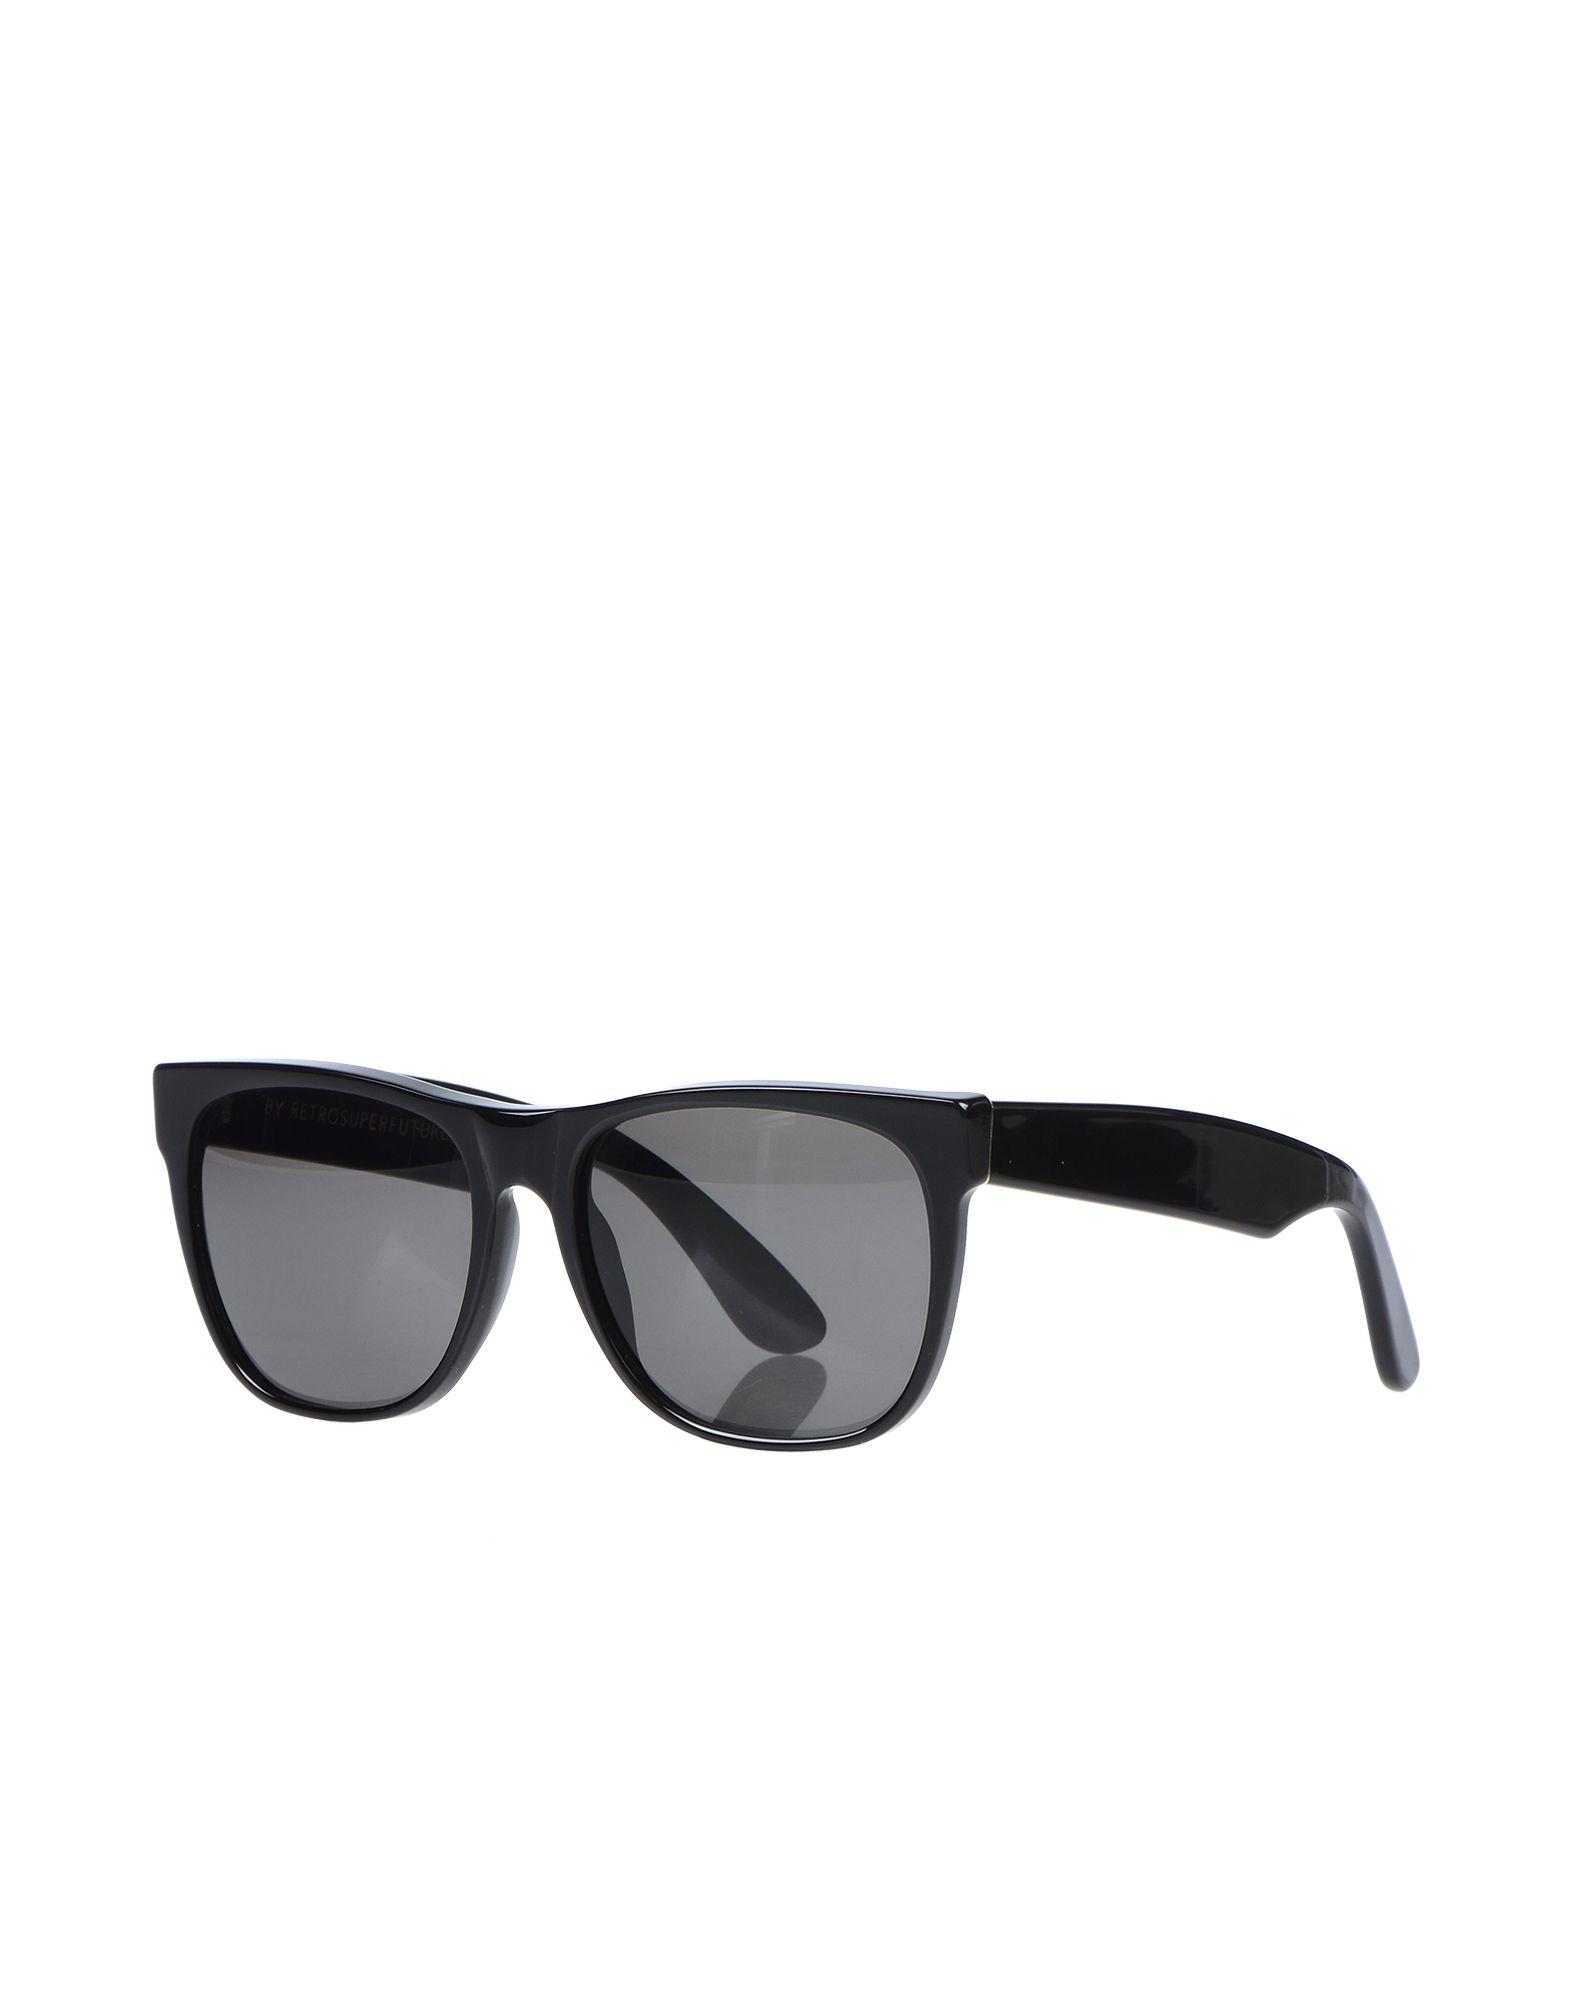 SUPER by RETROSUPERFUTURE Солнечные очки web eyewear солнечные очки